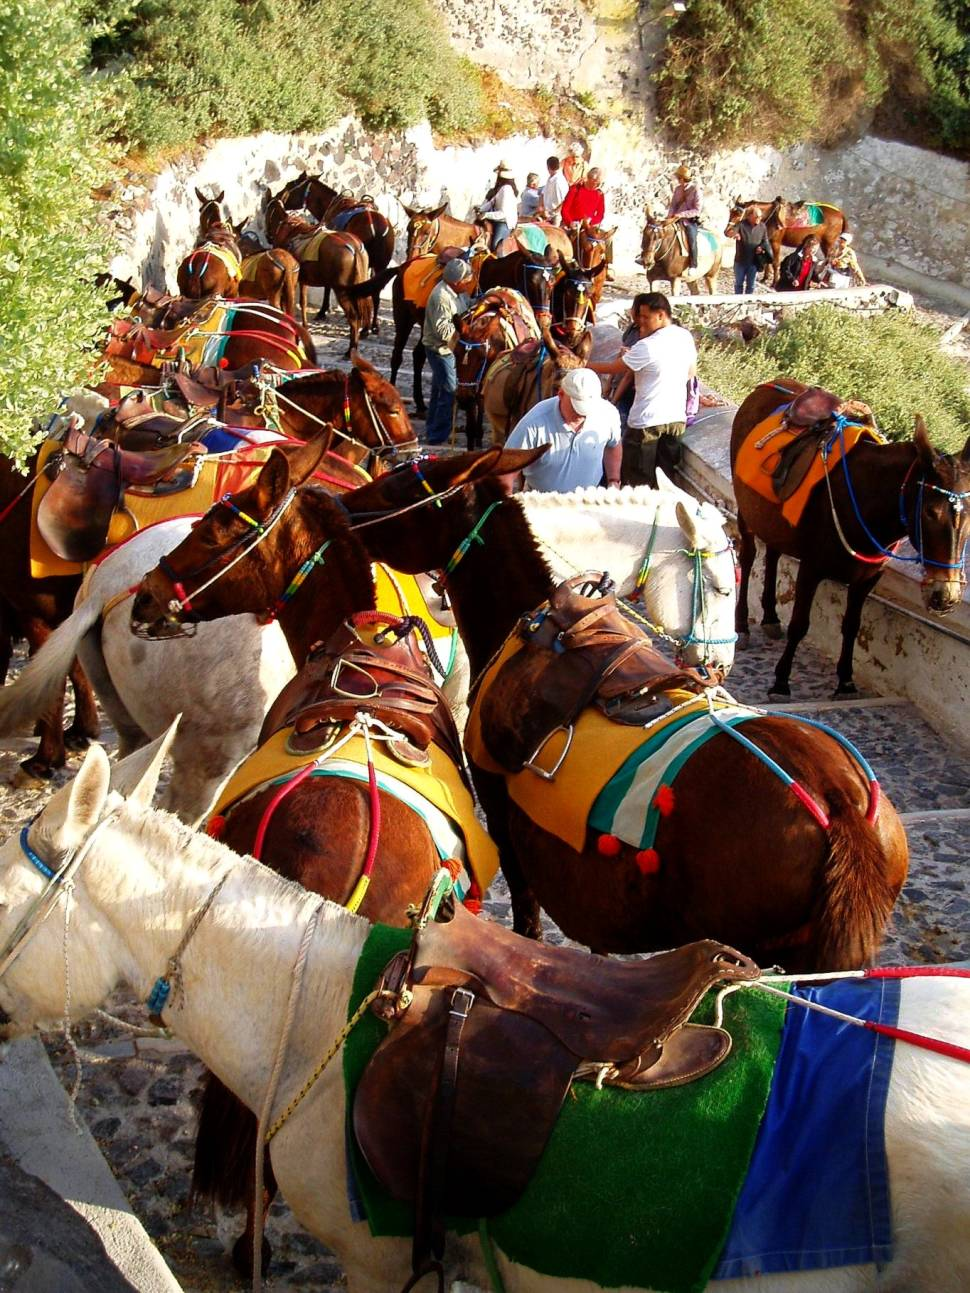 Donkey Ride in Santorini - Best Season